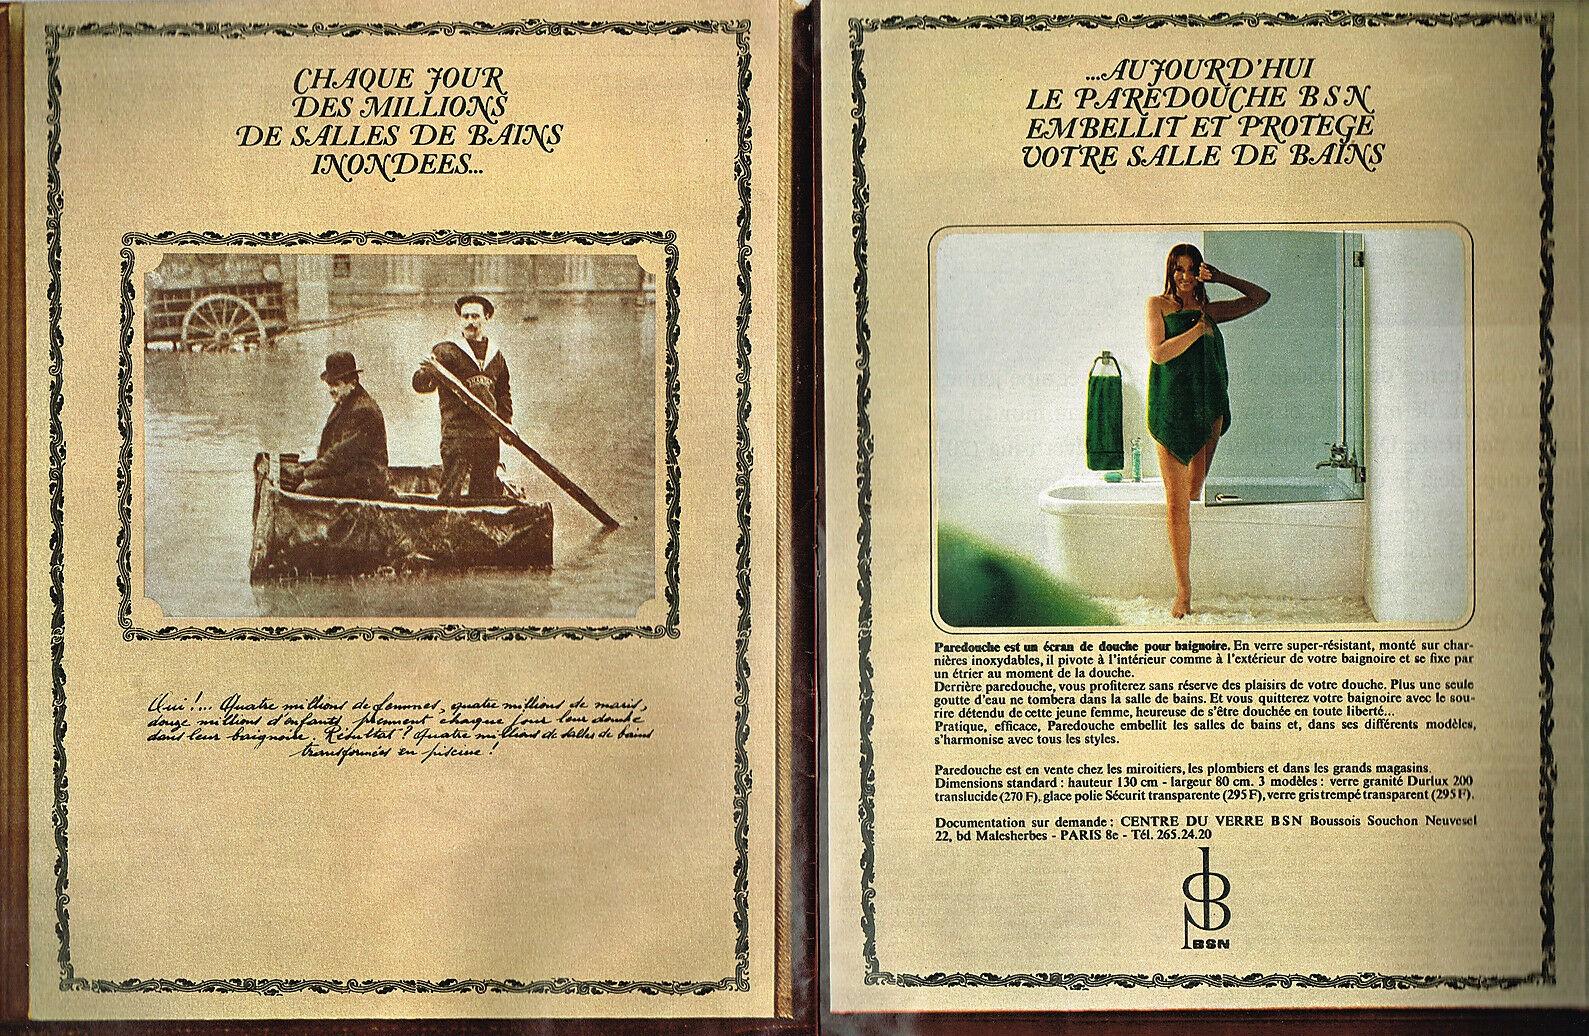 1968 BSN pare douche